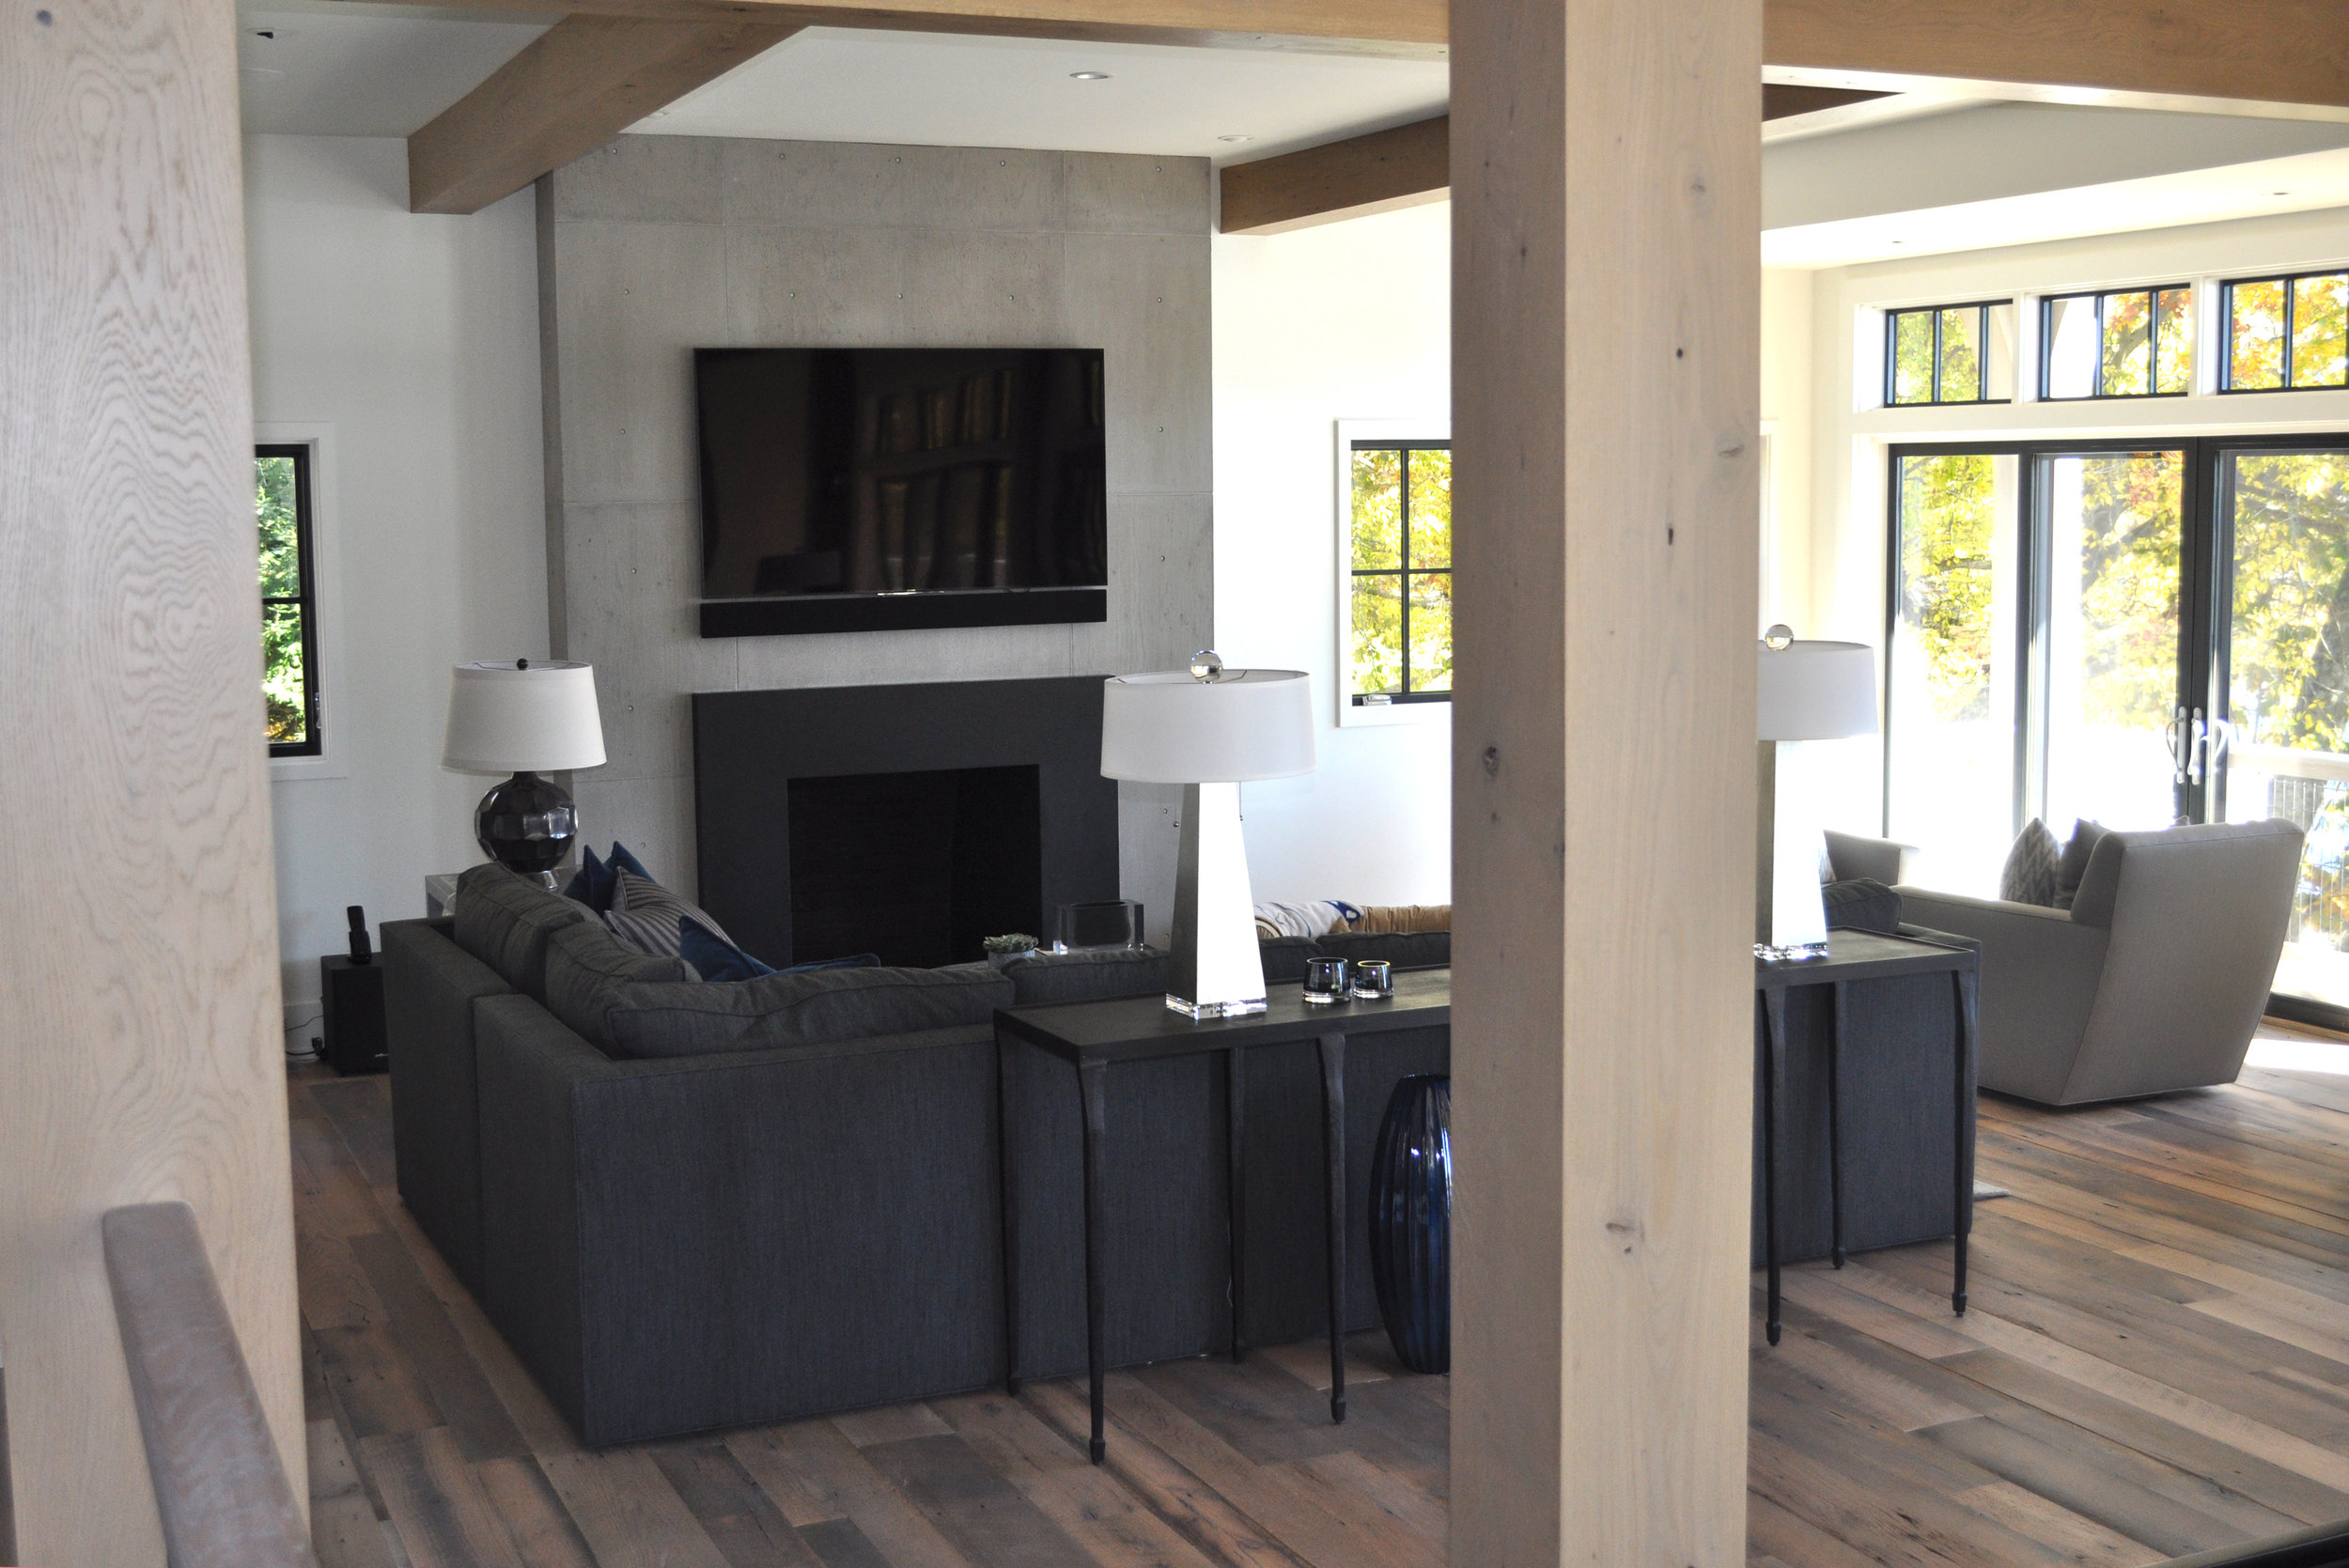 Concret Fireplace